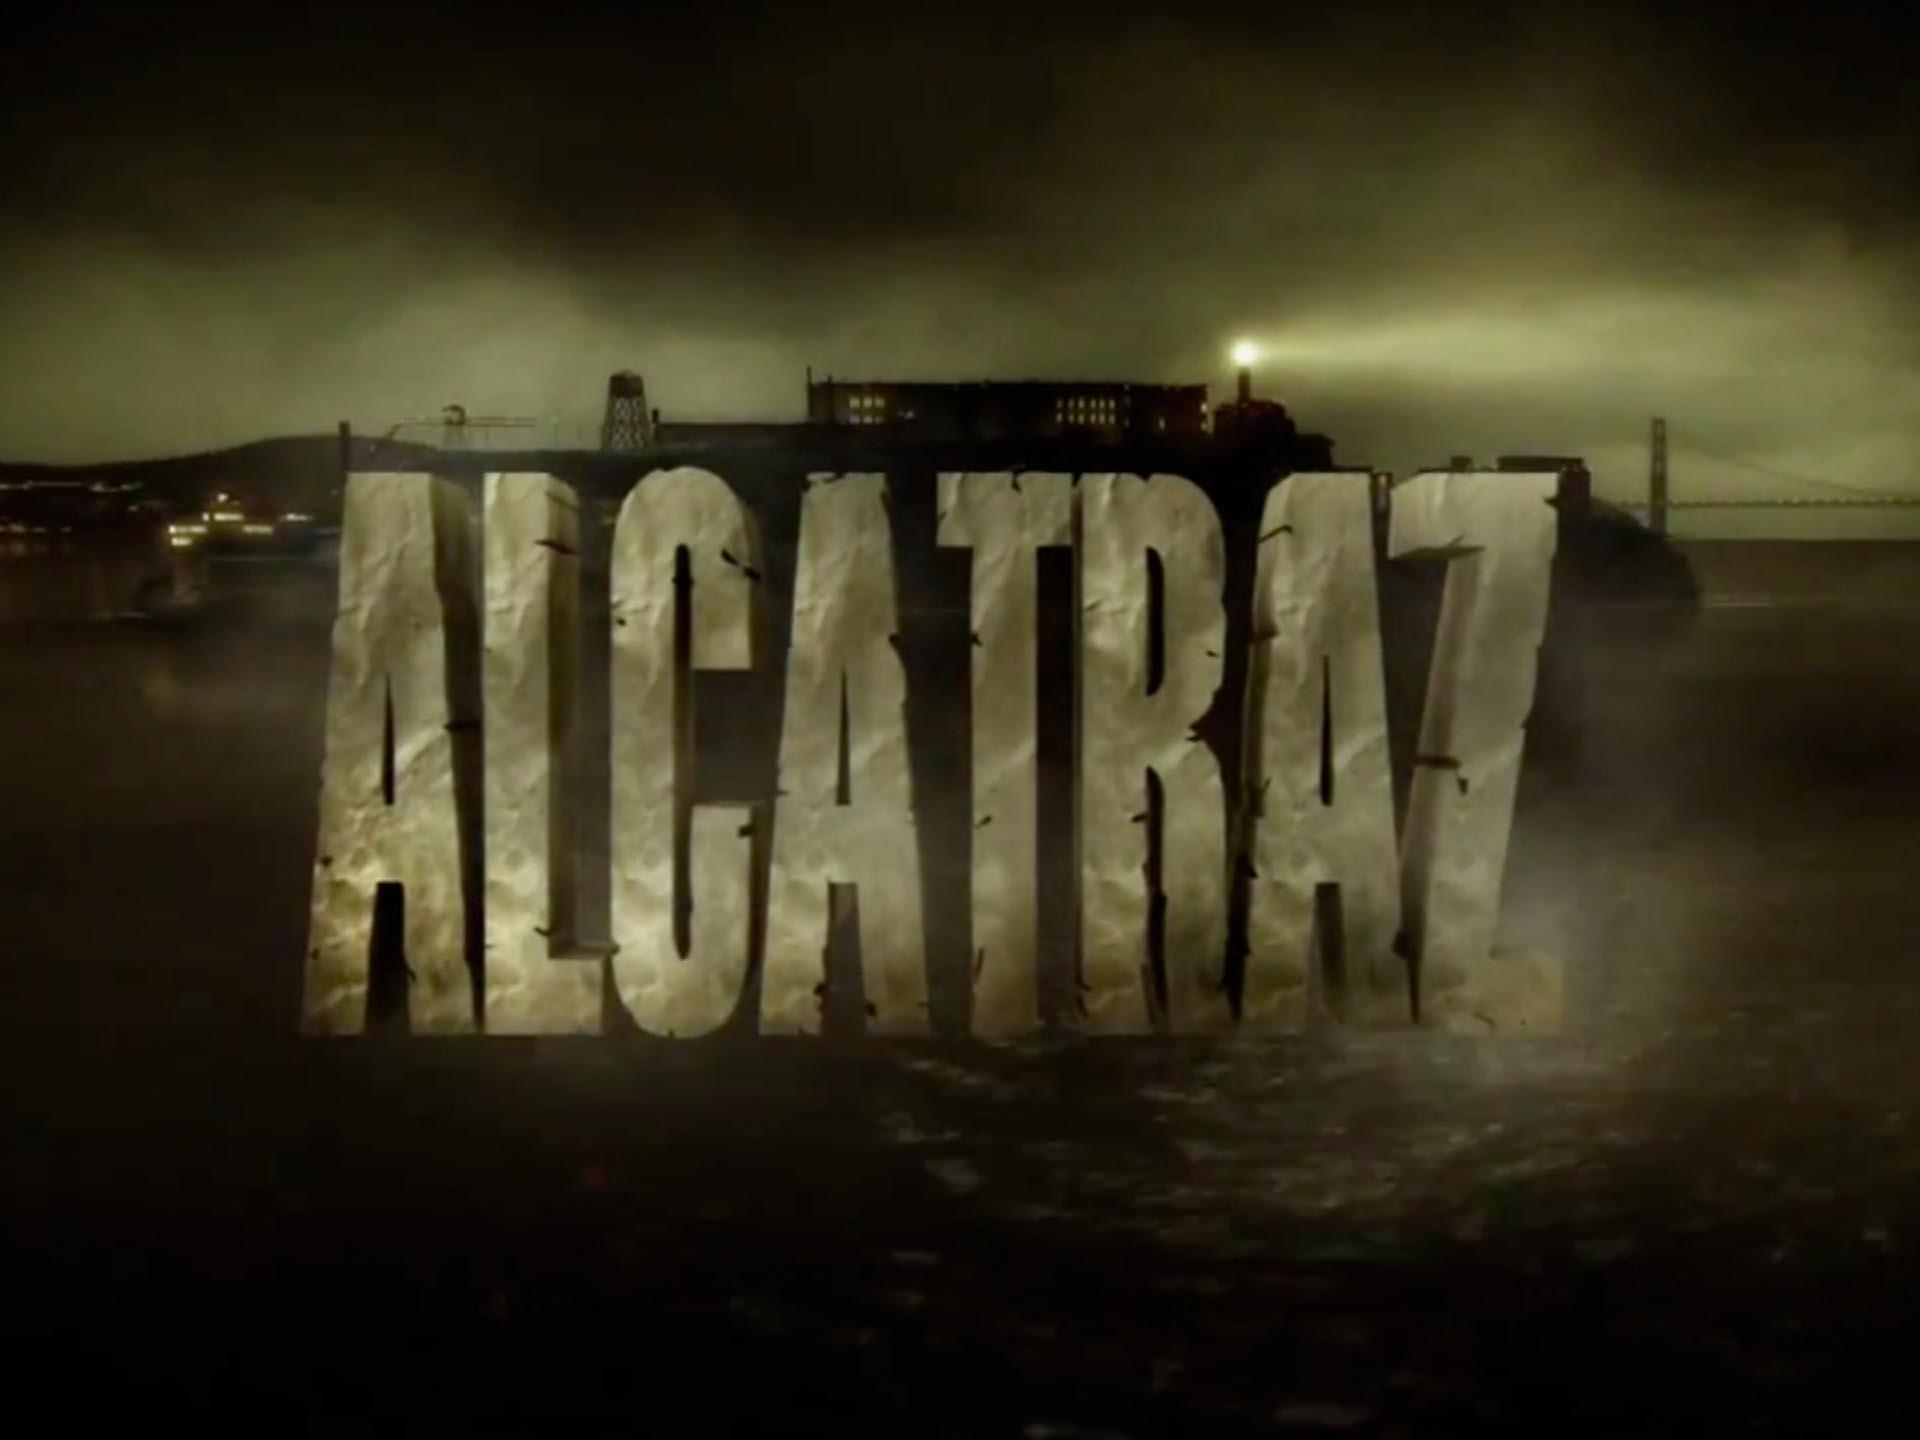 22116_alcatraz_wallpaper_14_122_419lo.jpg